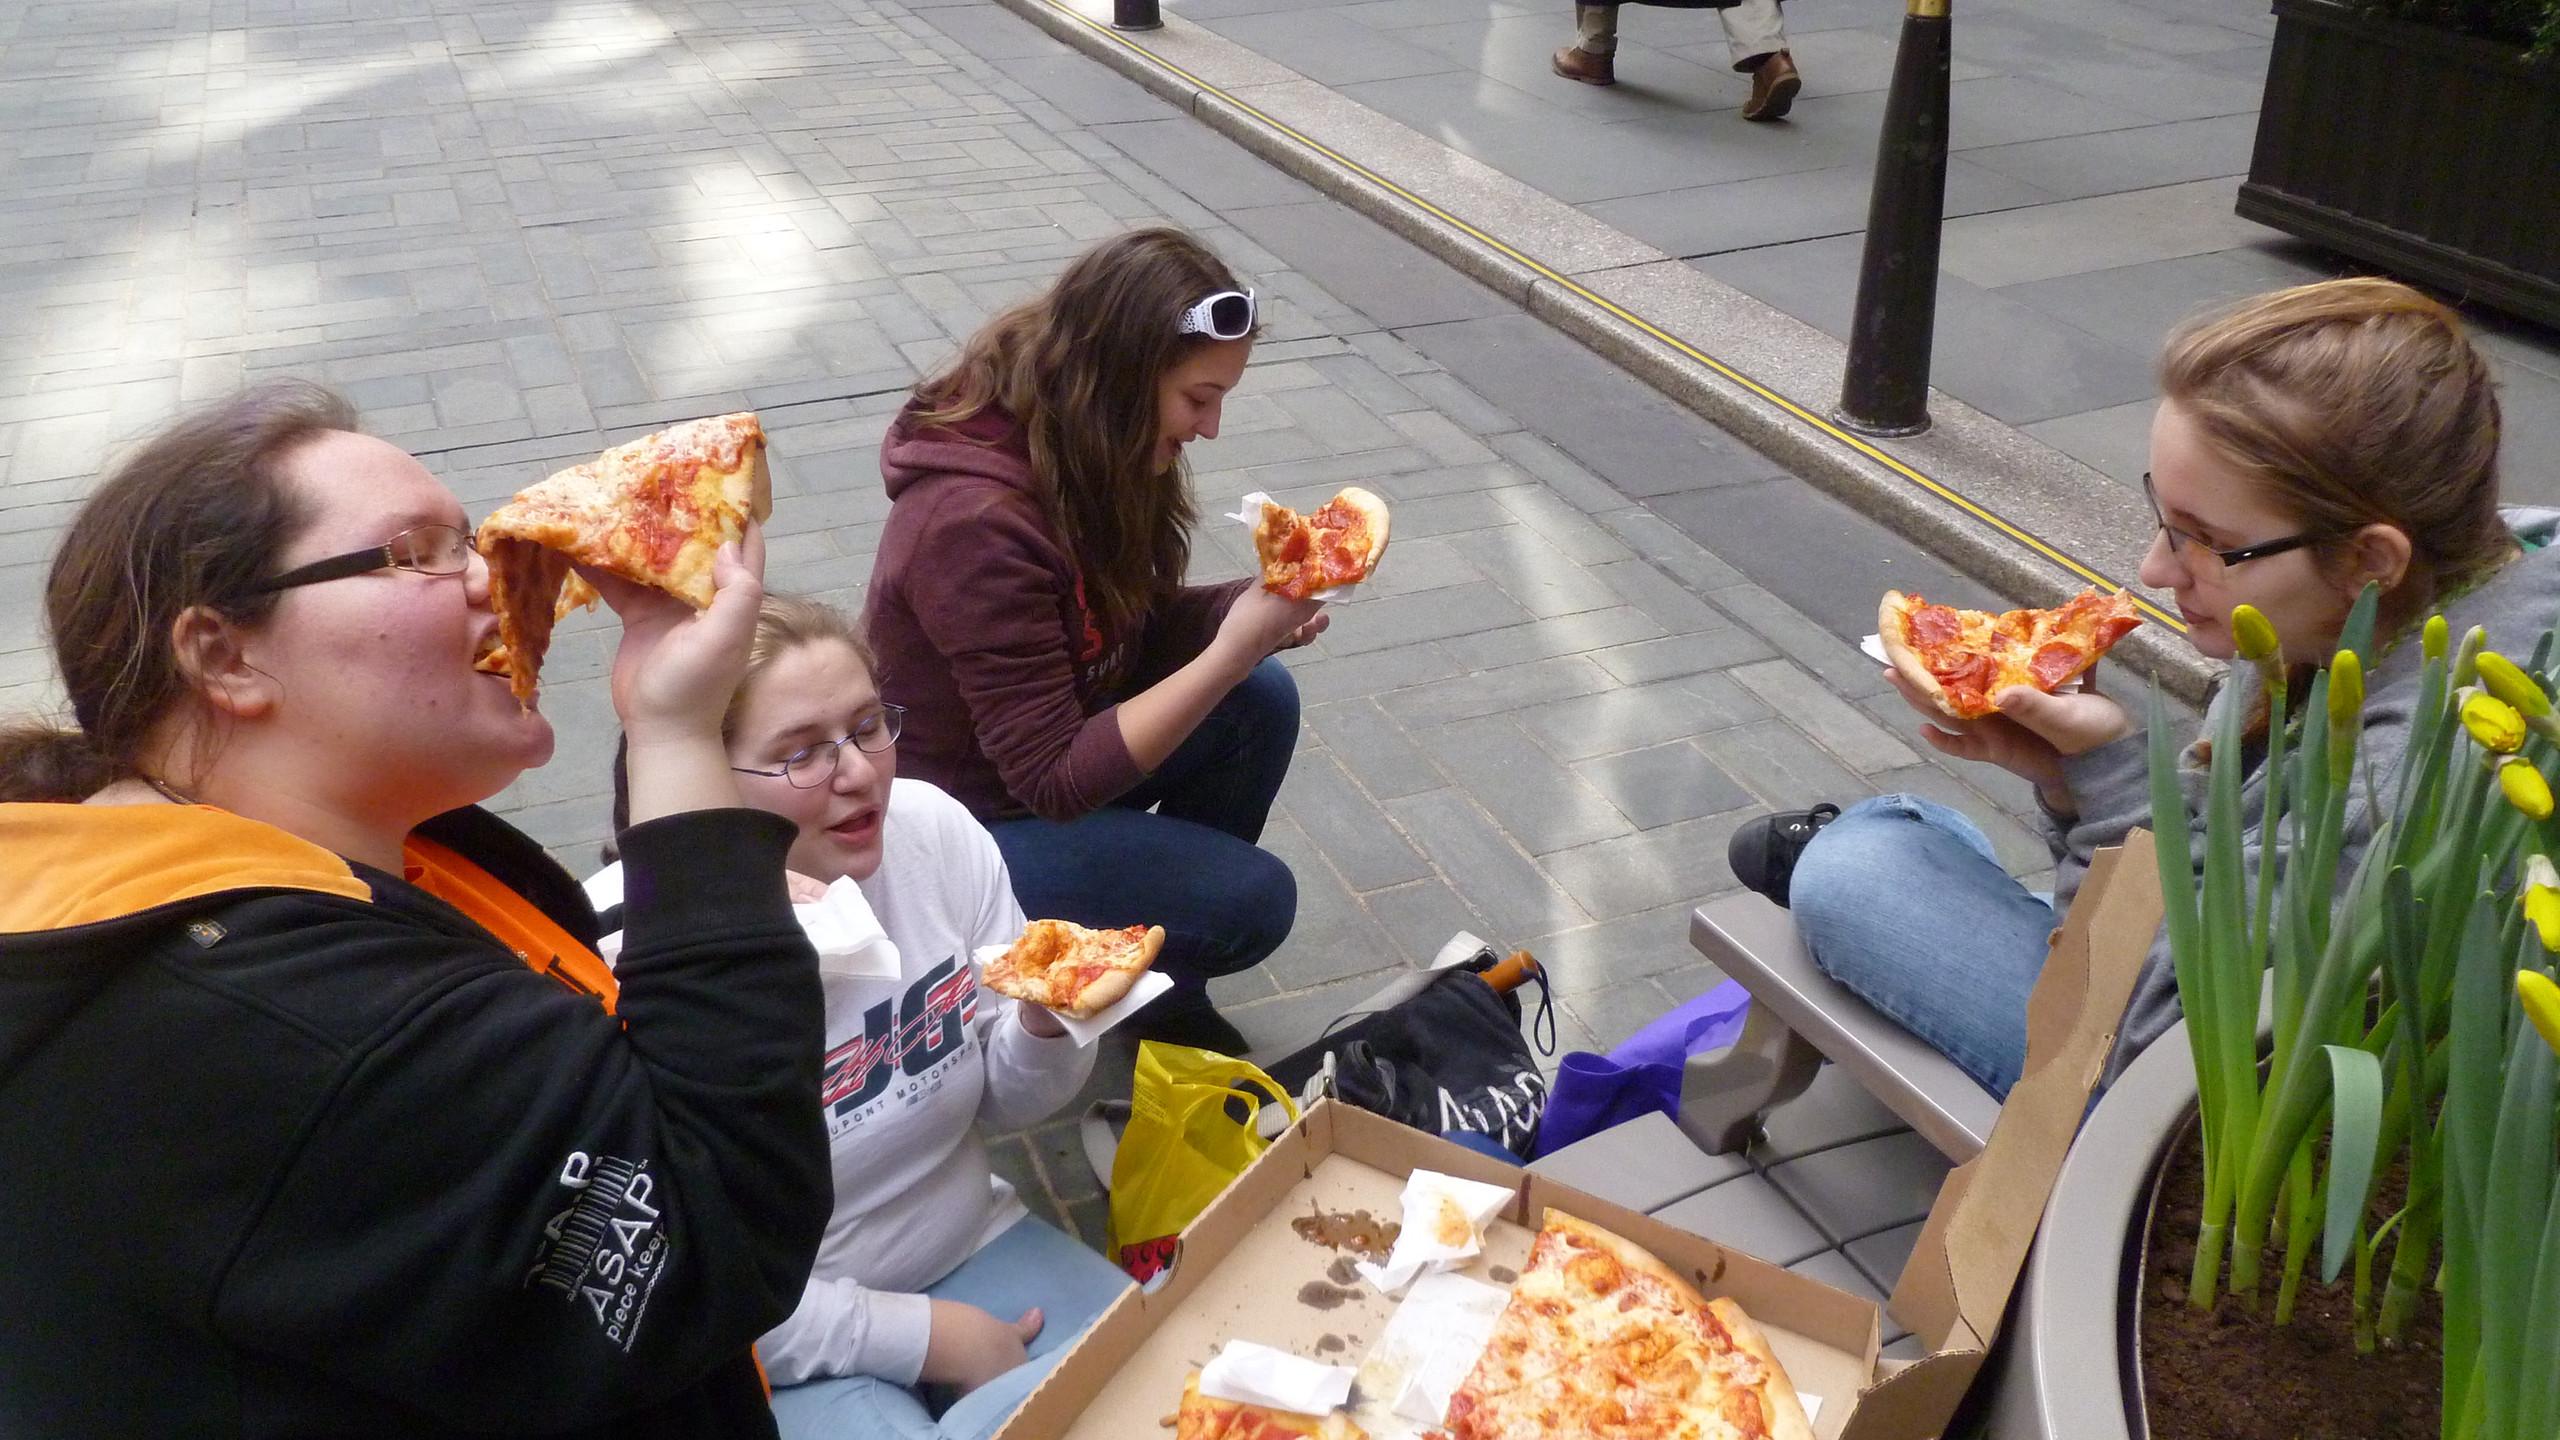 Sitting in Rockefeller Plaza eating New York pizza for lunch!